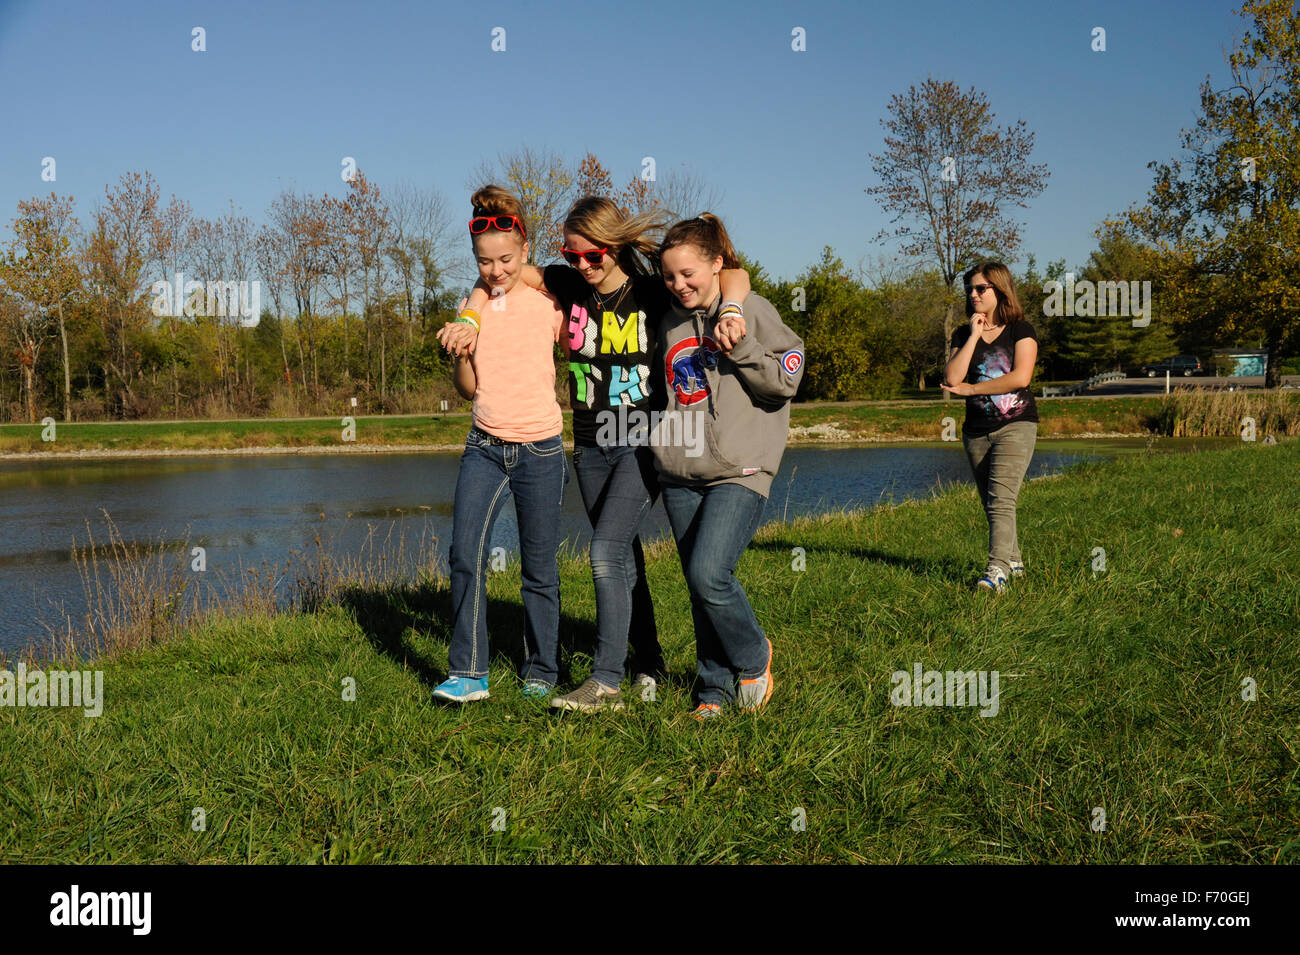 Three teen girls ignoring one girl - Stock Image